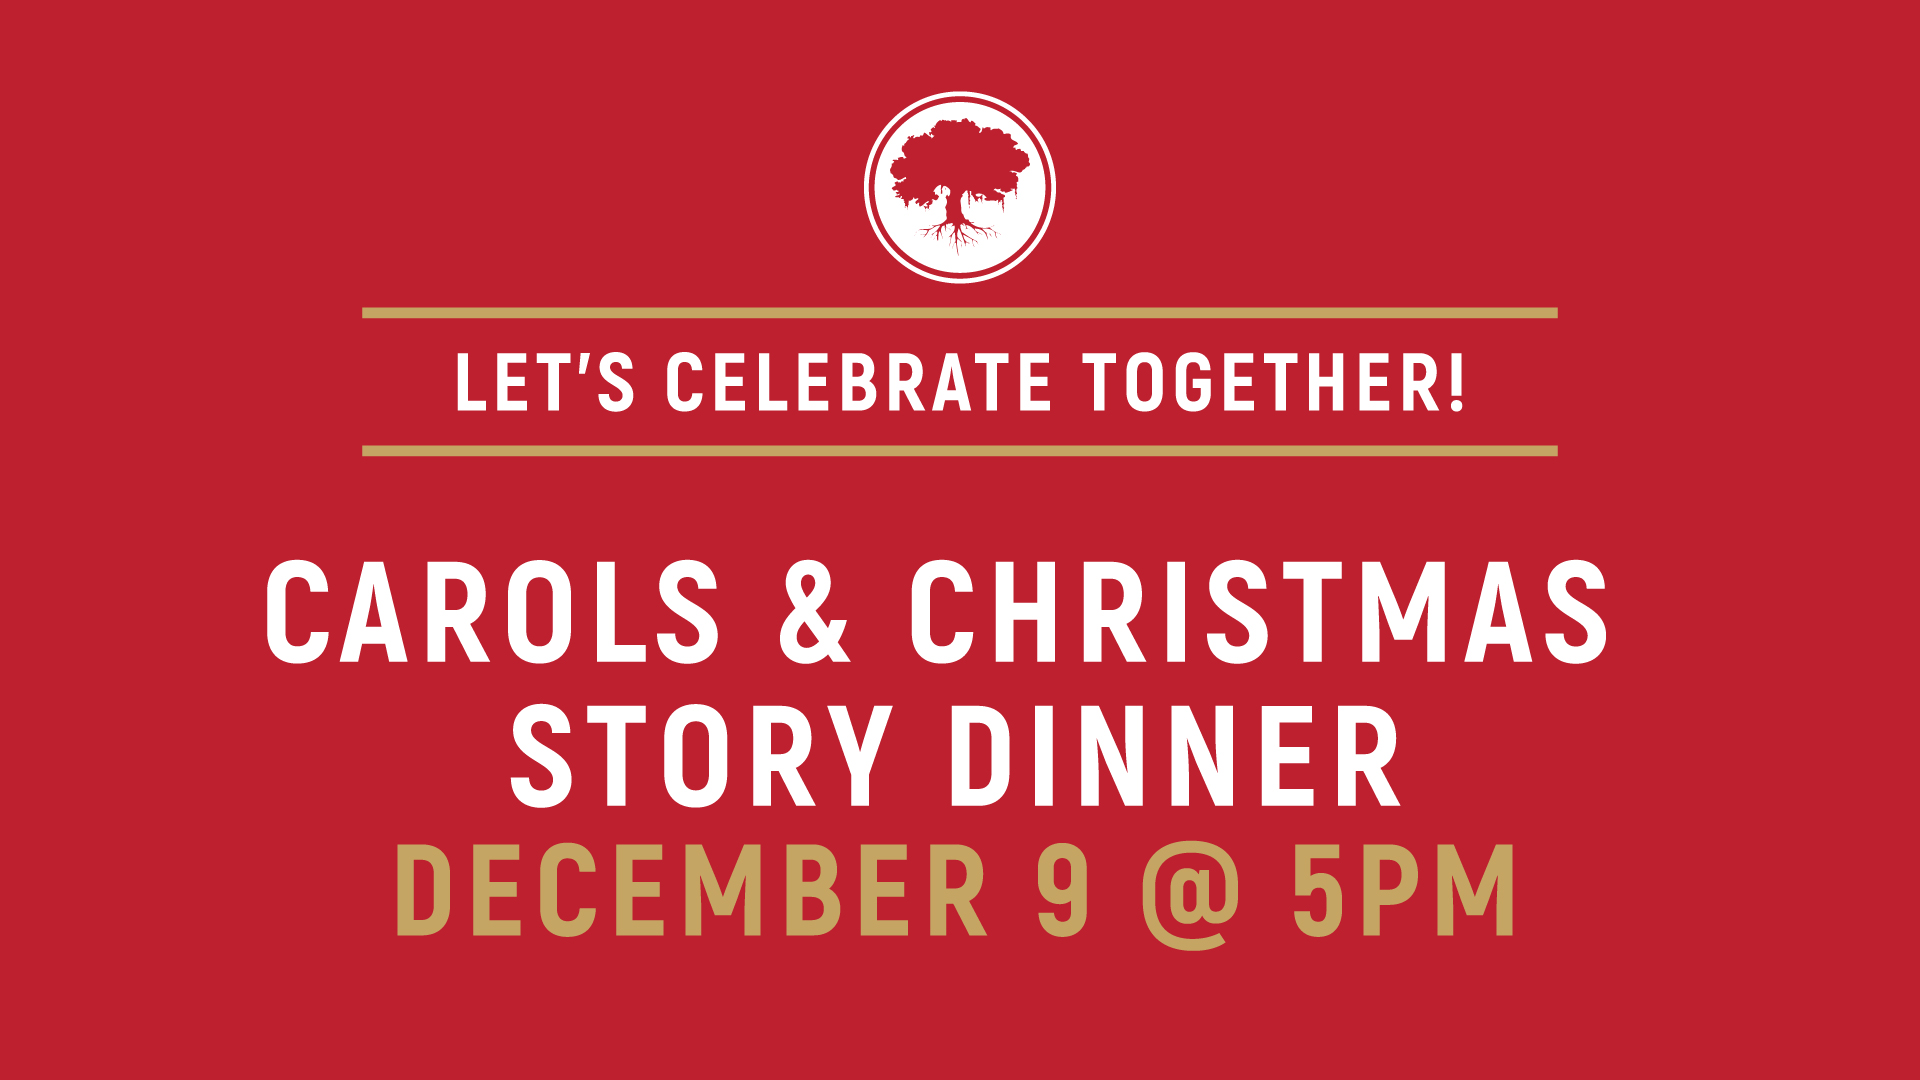 Carols and Christmas Story Dinner